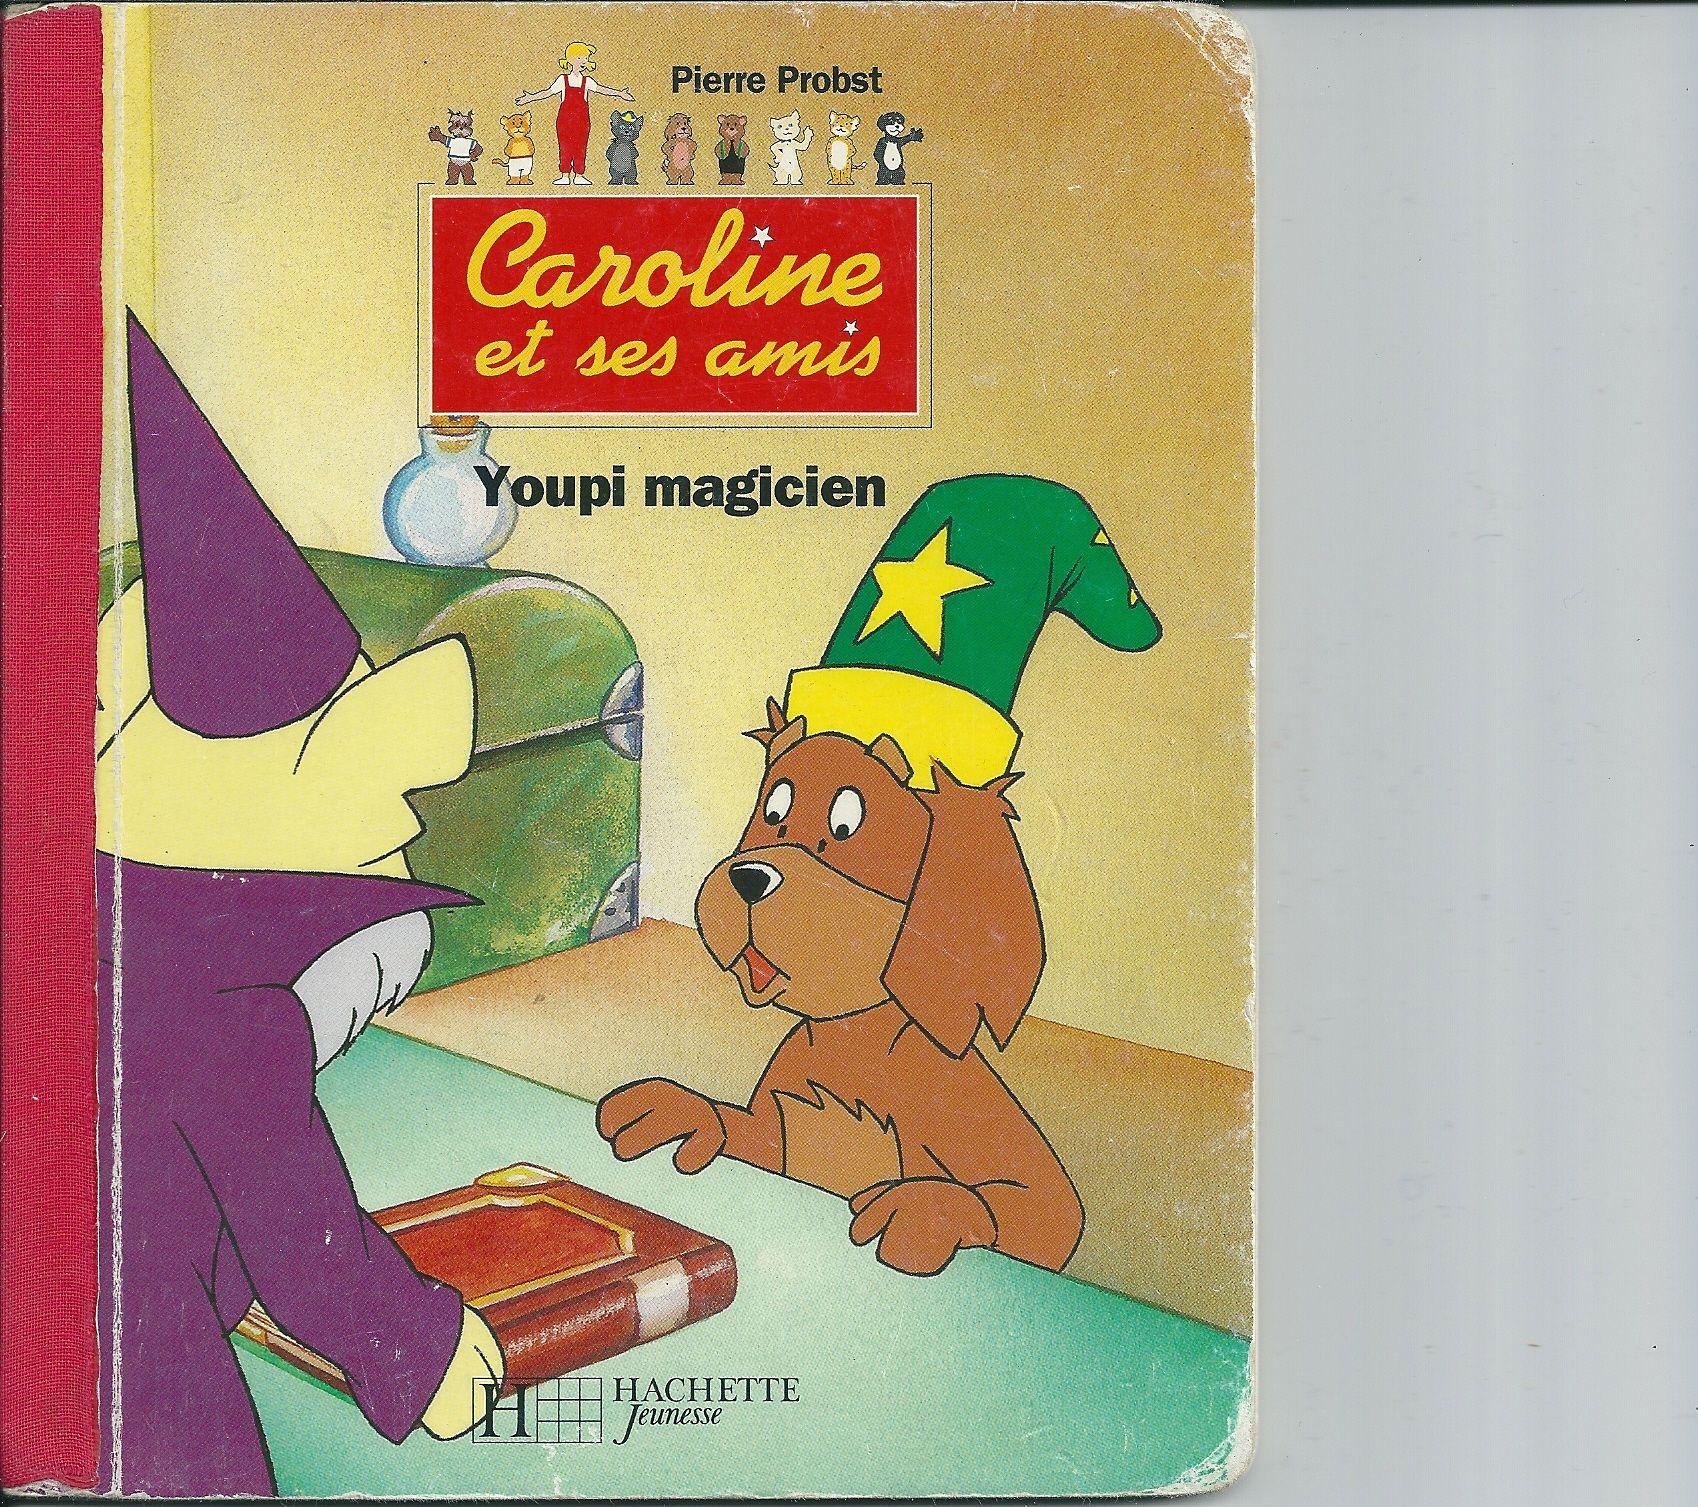 Caroline et ses amis - Youpi magicien